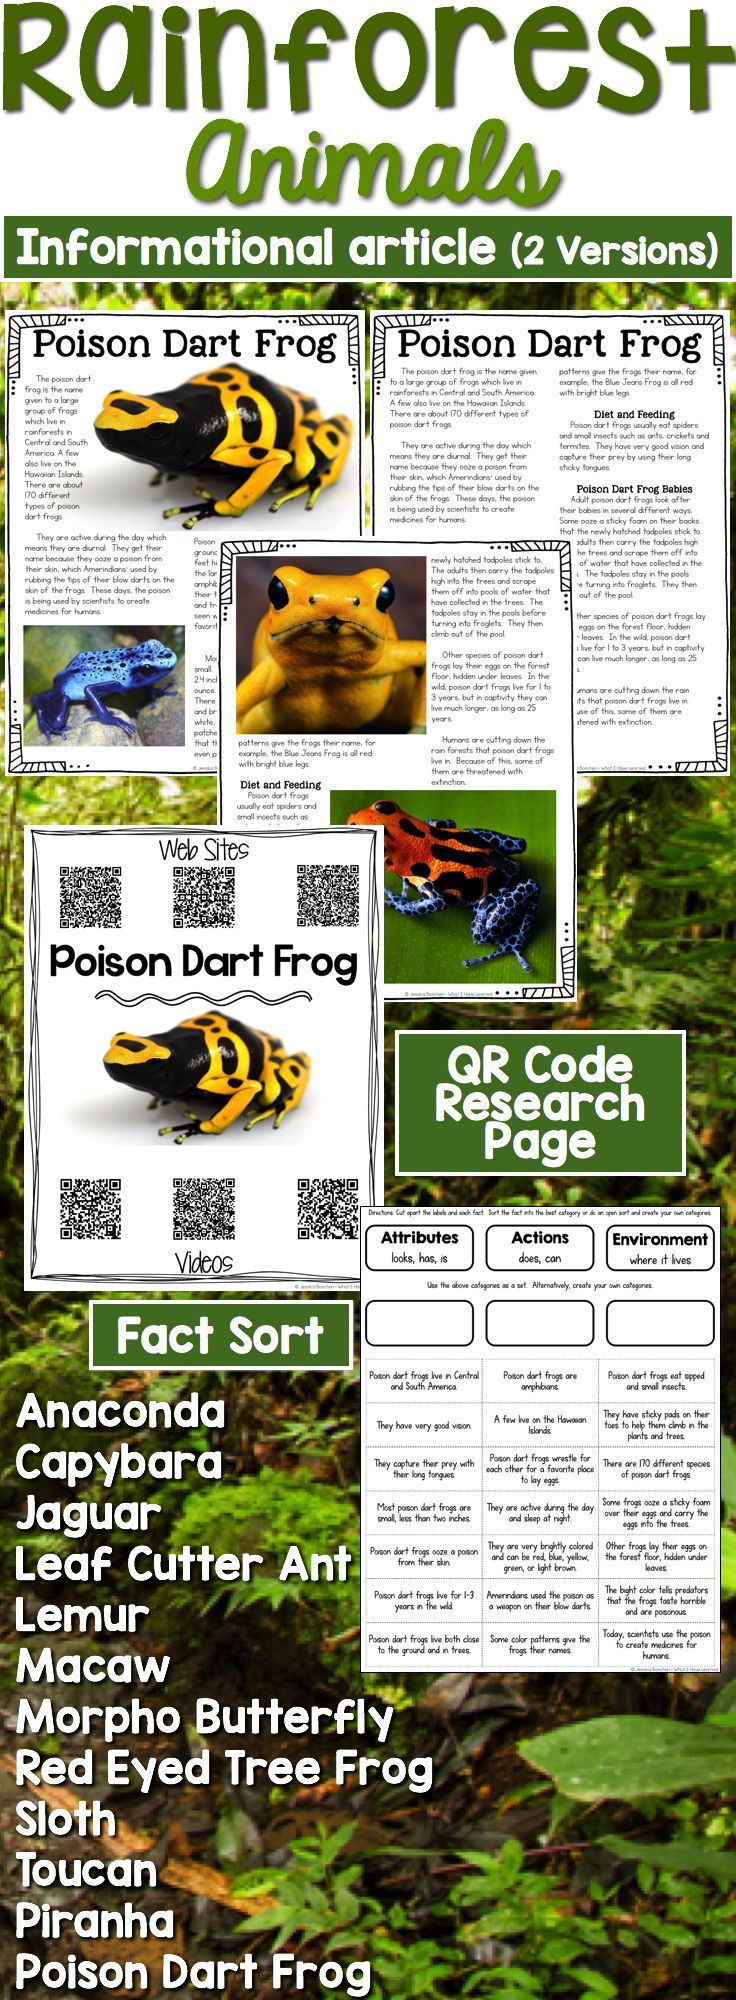 25+ best ideas about Endangered rainforest animals on Pinterest ...